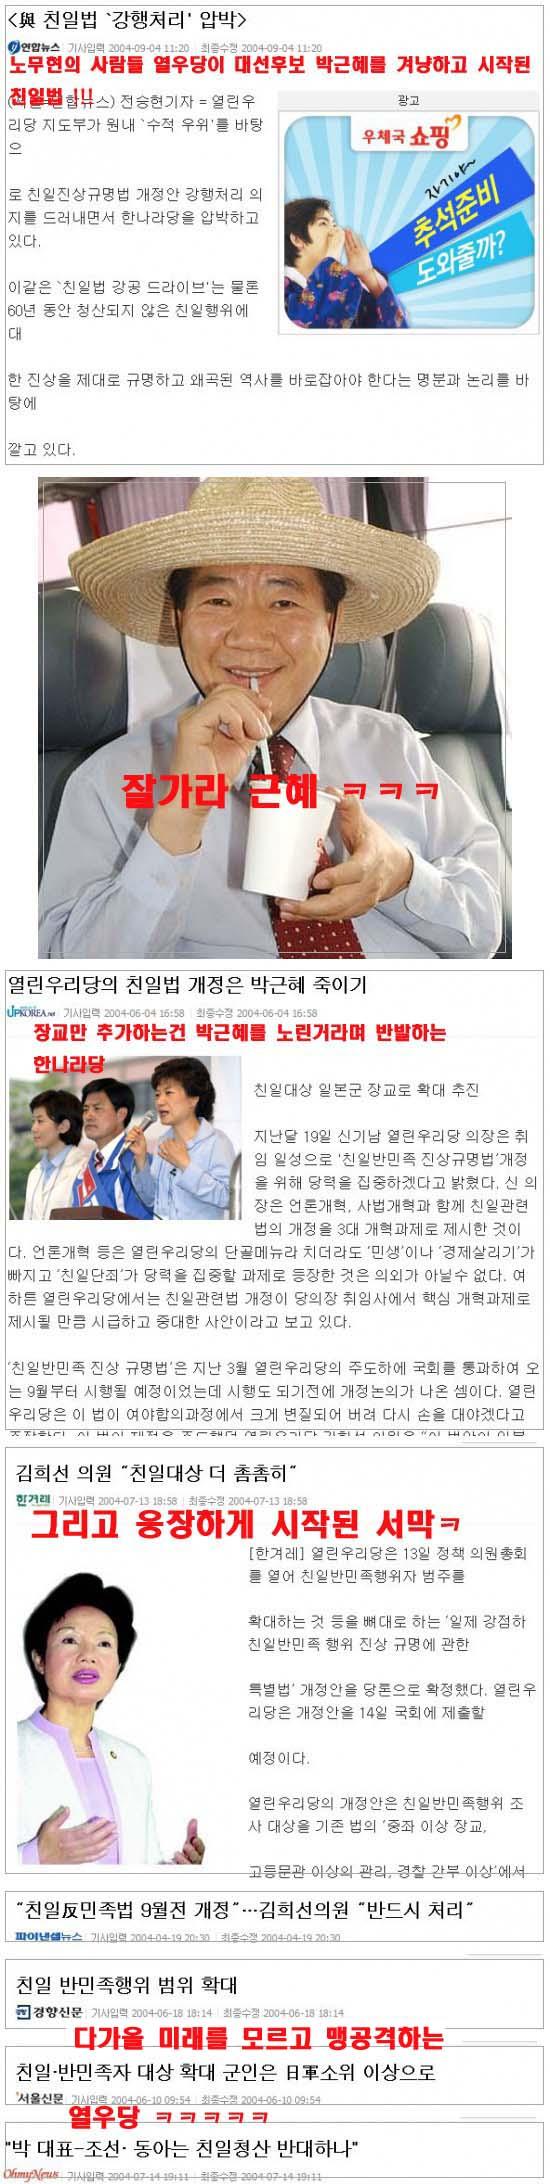 1.jpg 대한민국 그 유명한 친일대첩.JPG